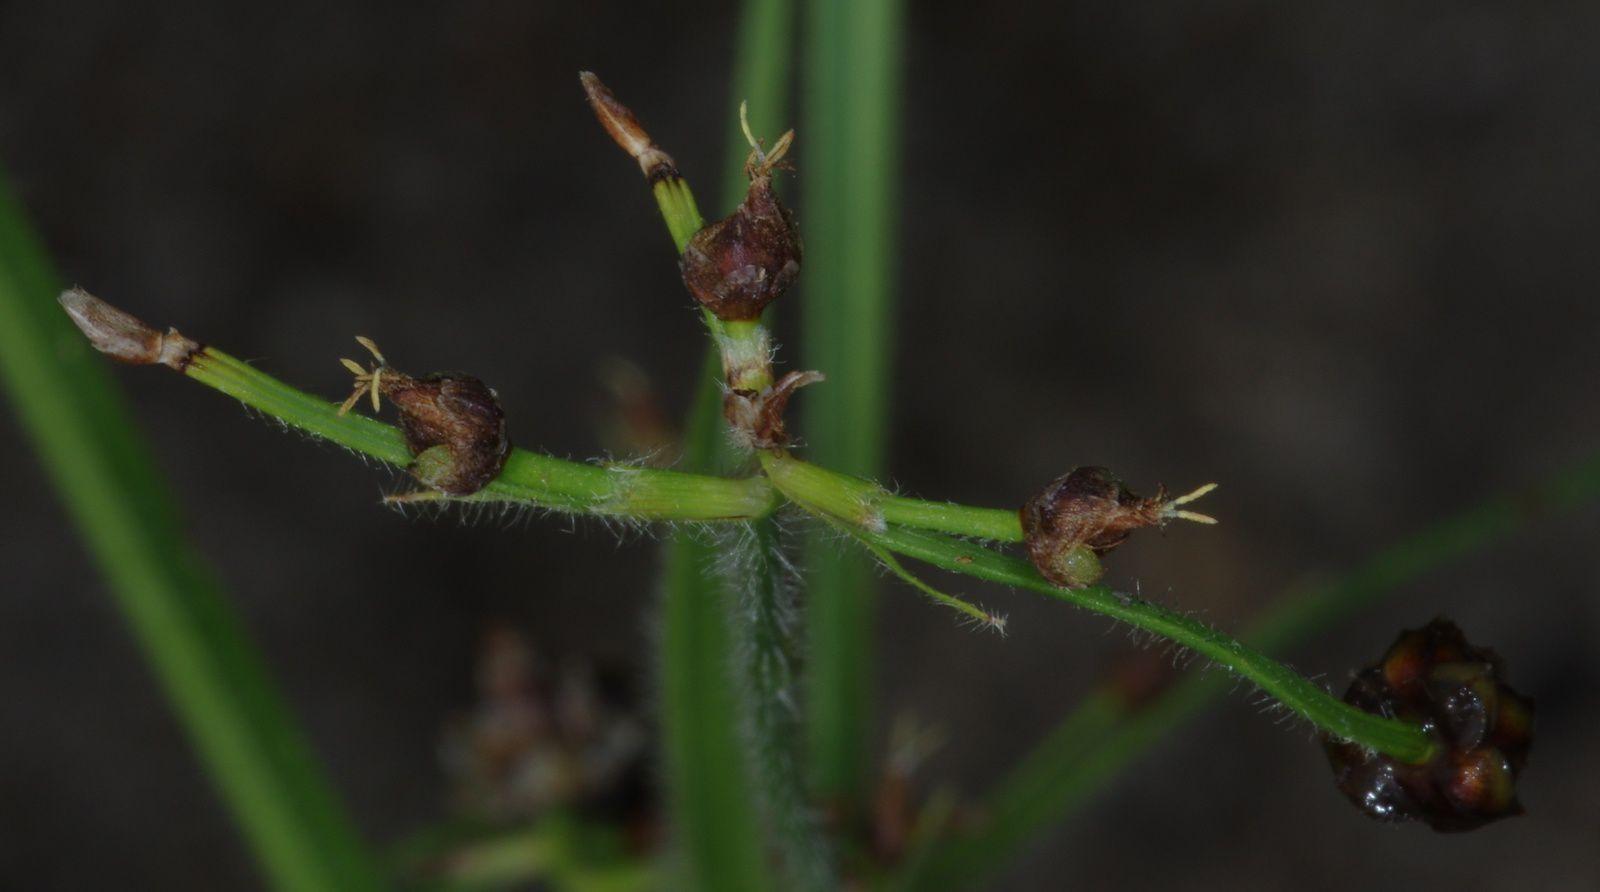 Rhynchospora divaricata